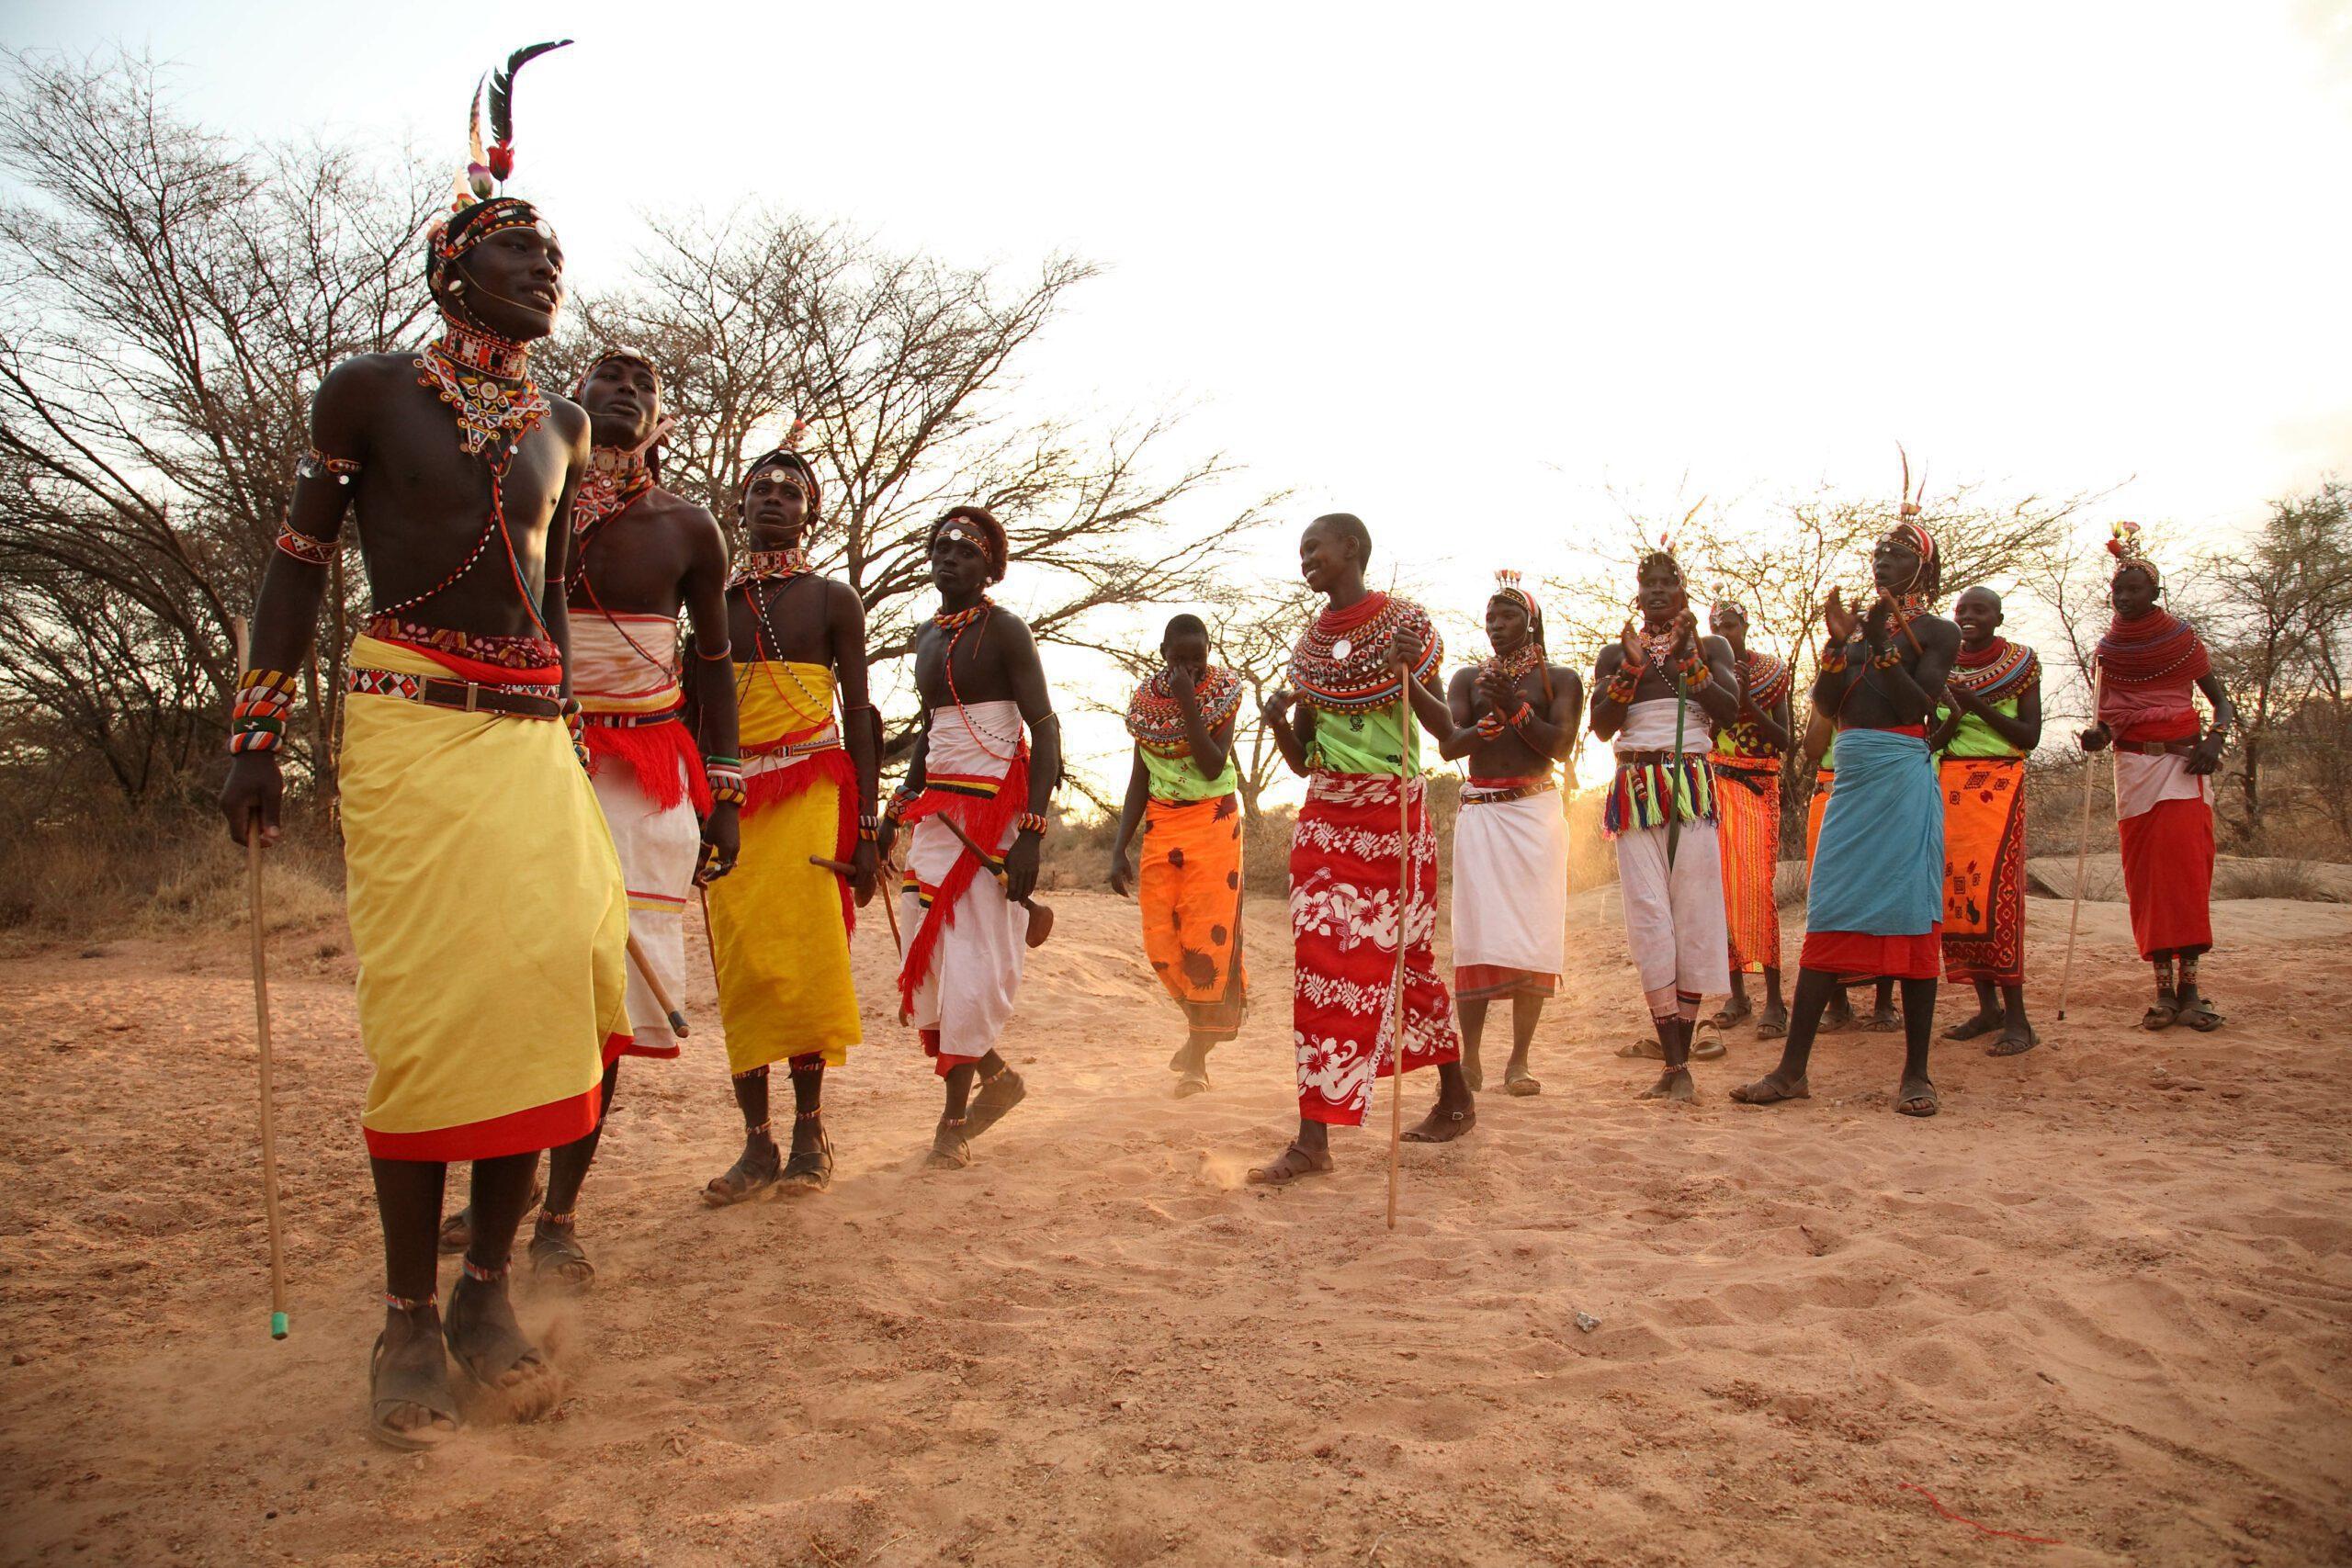 fly-in Kenya Safari visits Samburu tribesmen gathering